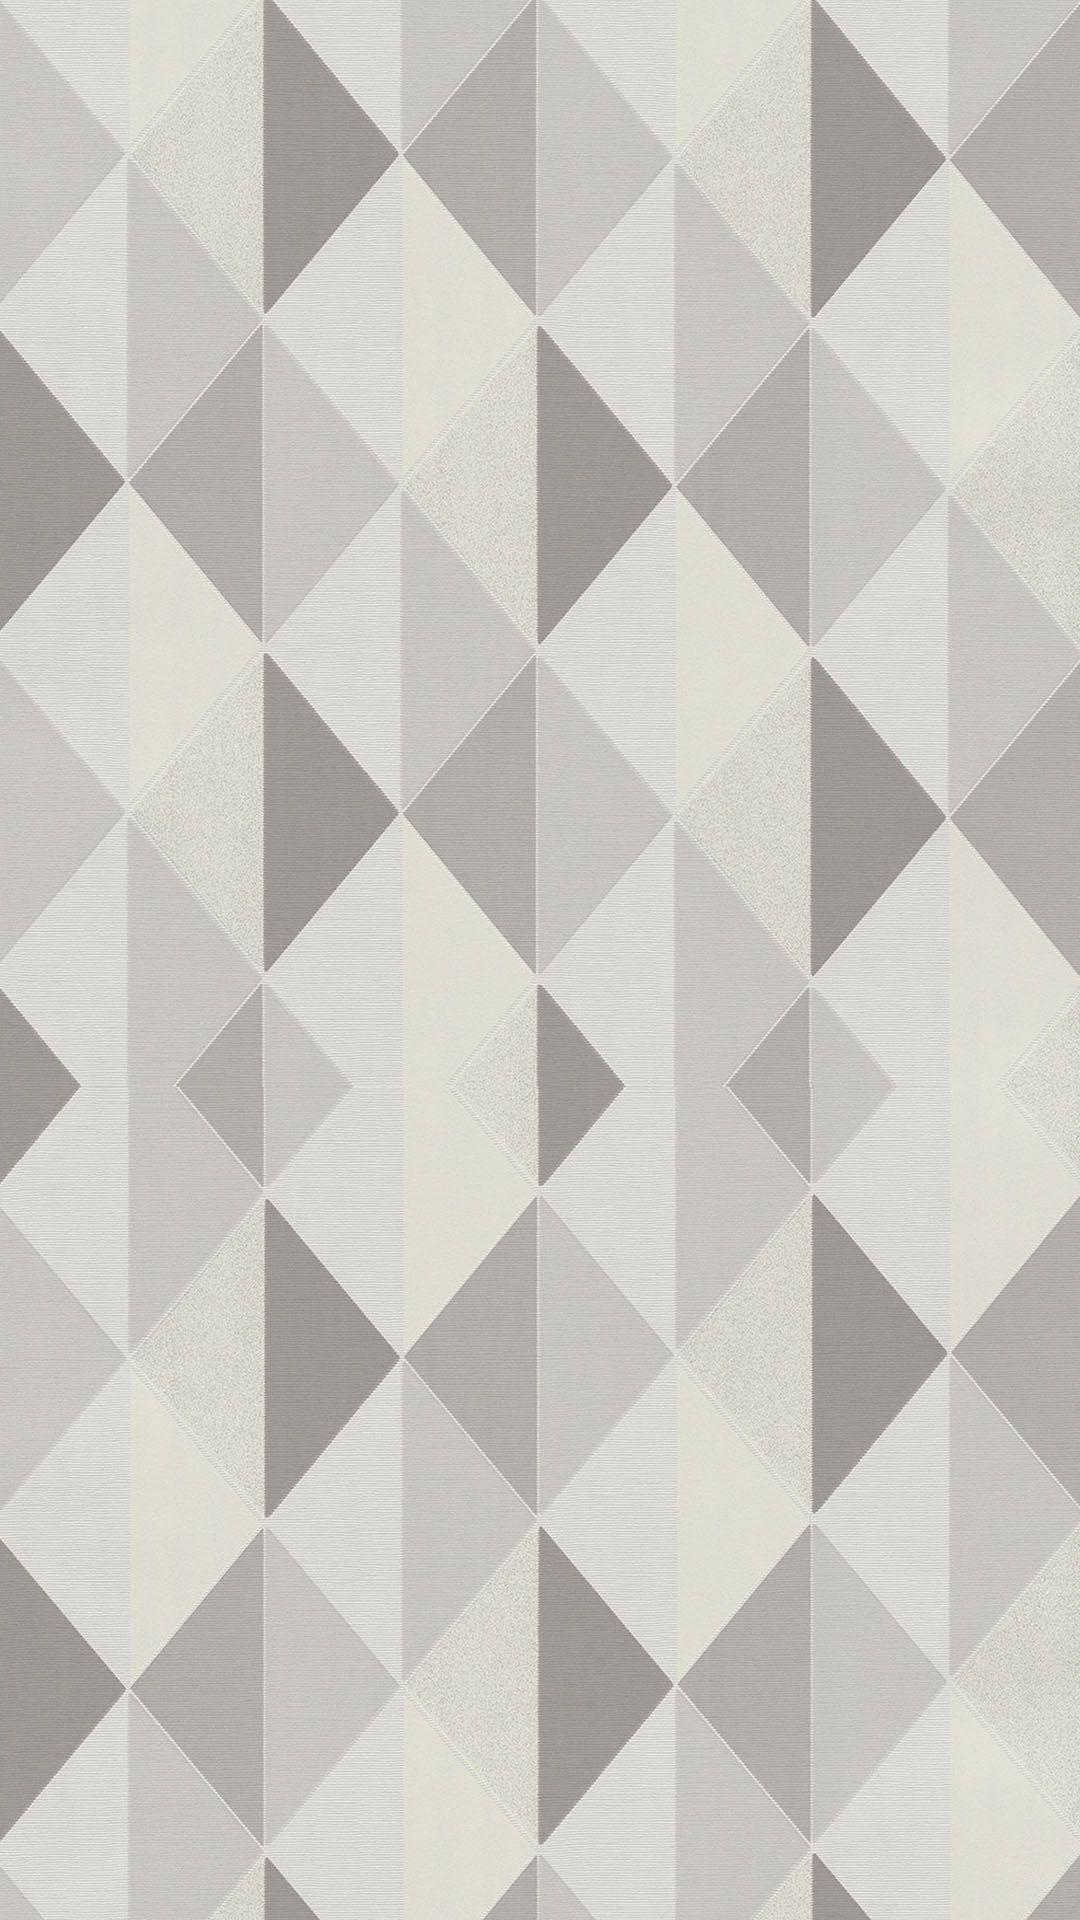 Tate Geometric Triangle Wallpaper Grey Silver In 2019